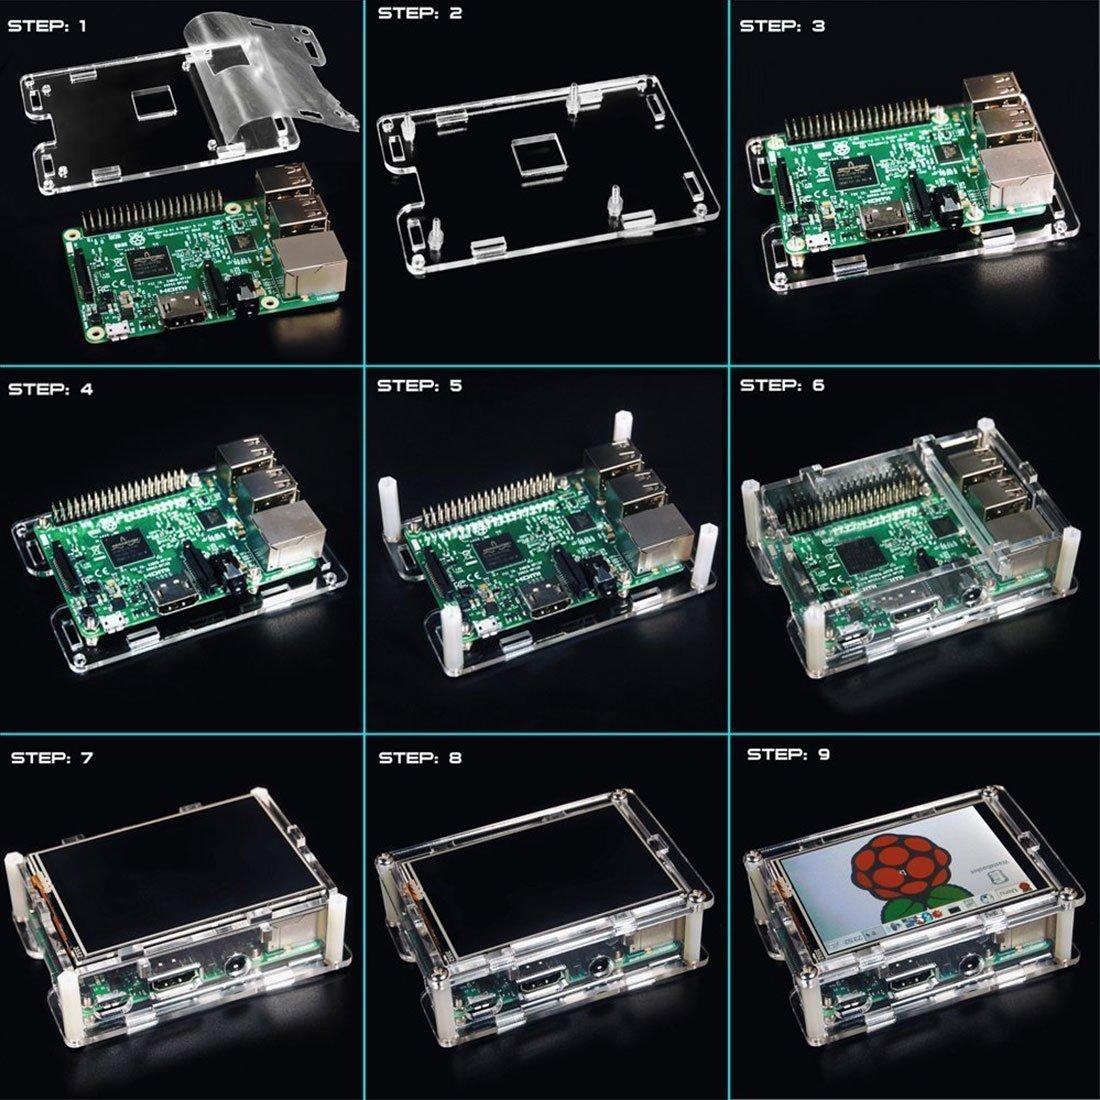 Dorhea Raspberry Pi 3 Model B TFT LCD Display Kit,3.5 inch 480x320 TFT Touch Screen Moudle with Protective Case Cooling Fan and Heatsinks for Raspberry Pi 3 B+,Pi 3 B, Pi 2, Pi Zero, Pi B+ by Dorhea (Image #7)